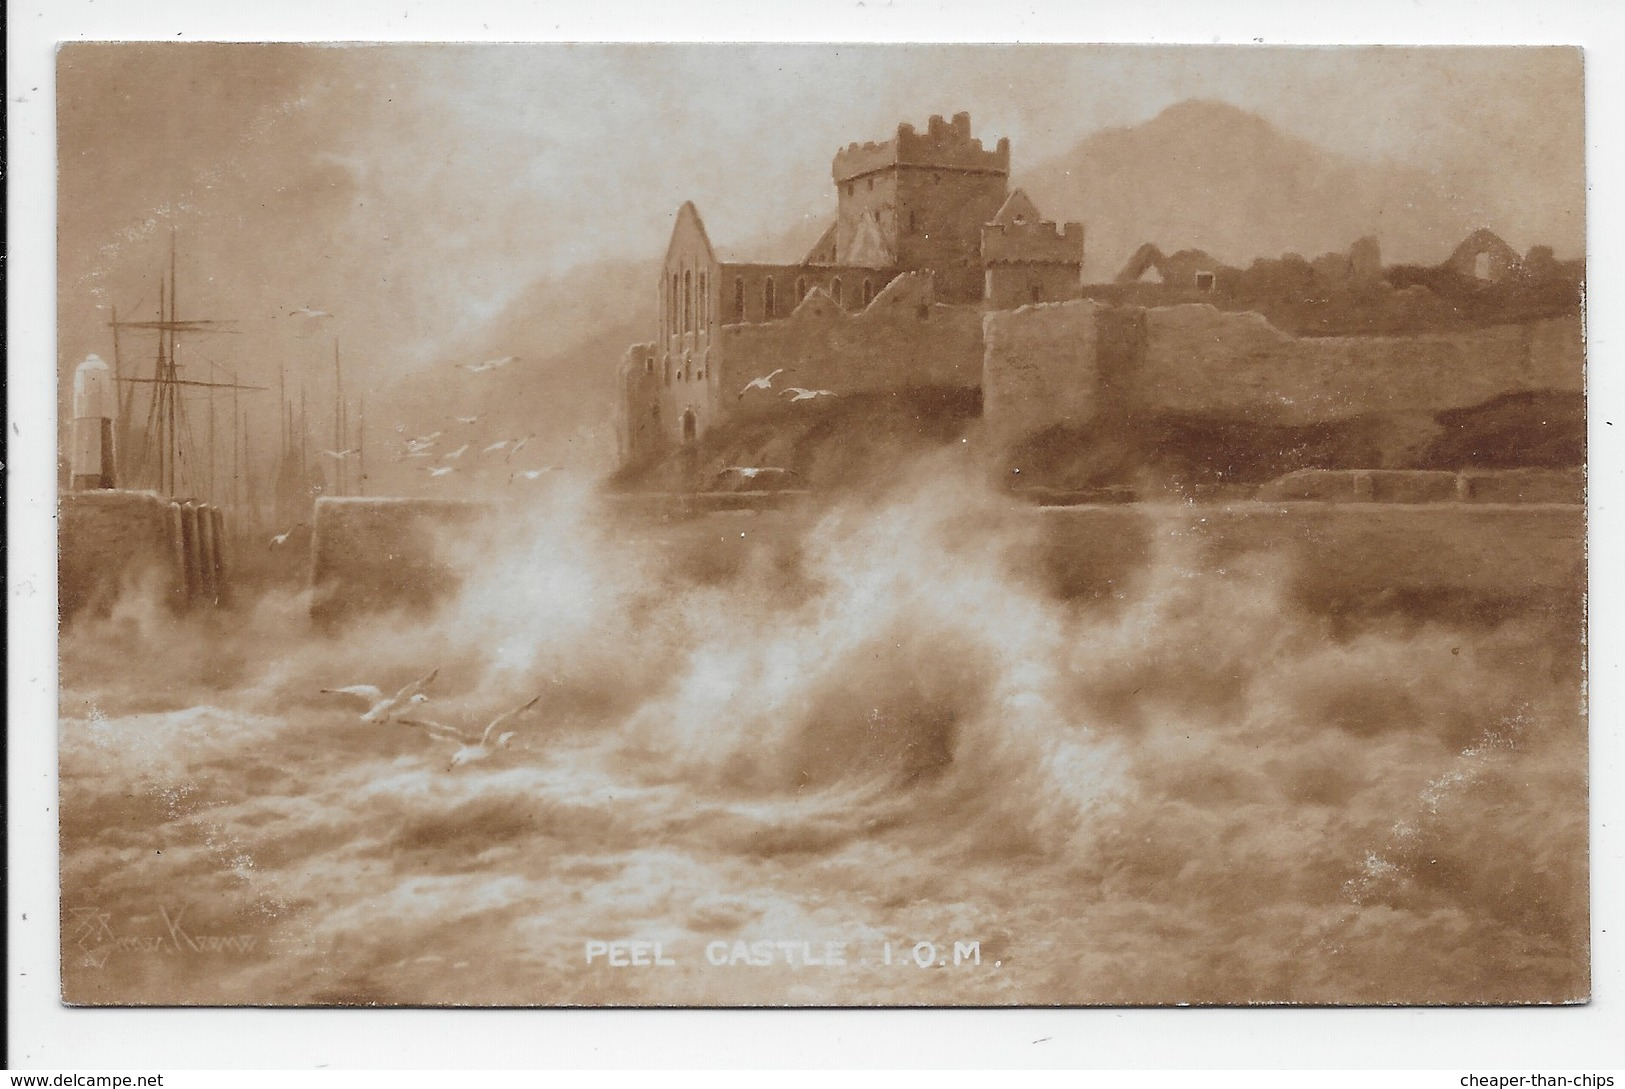 Peel Castle. I.O.M. - Elmer Keene - Isle Of Man